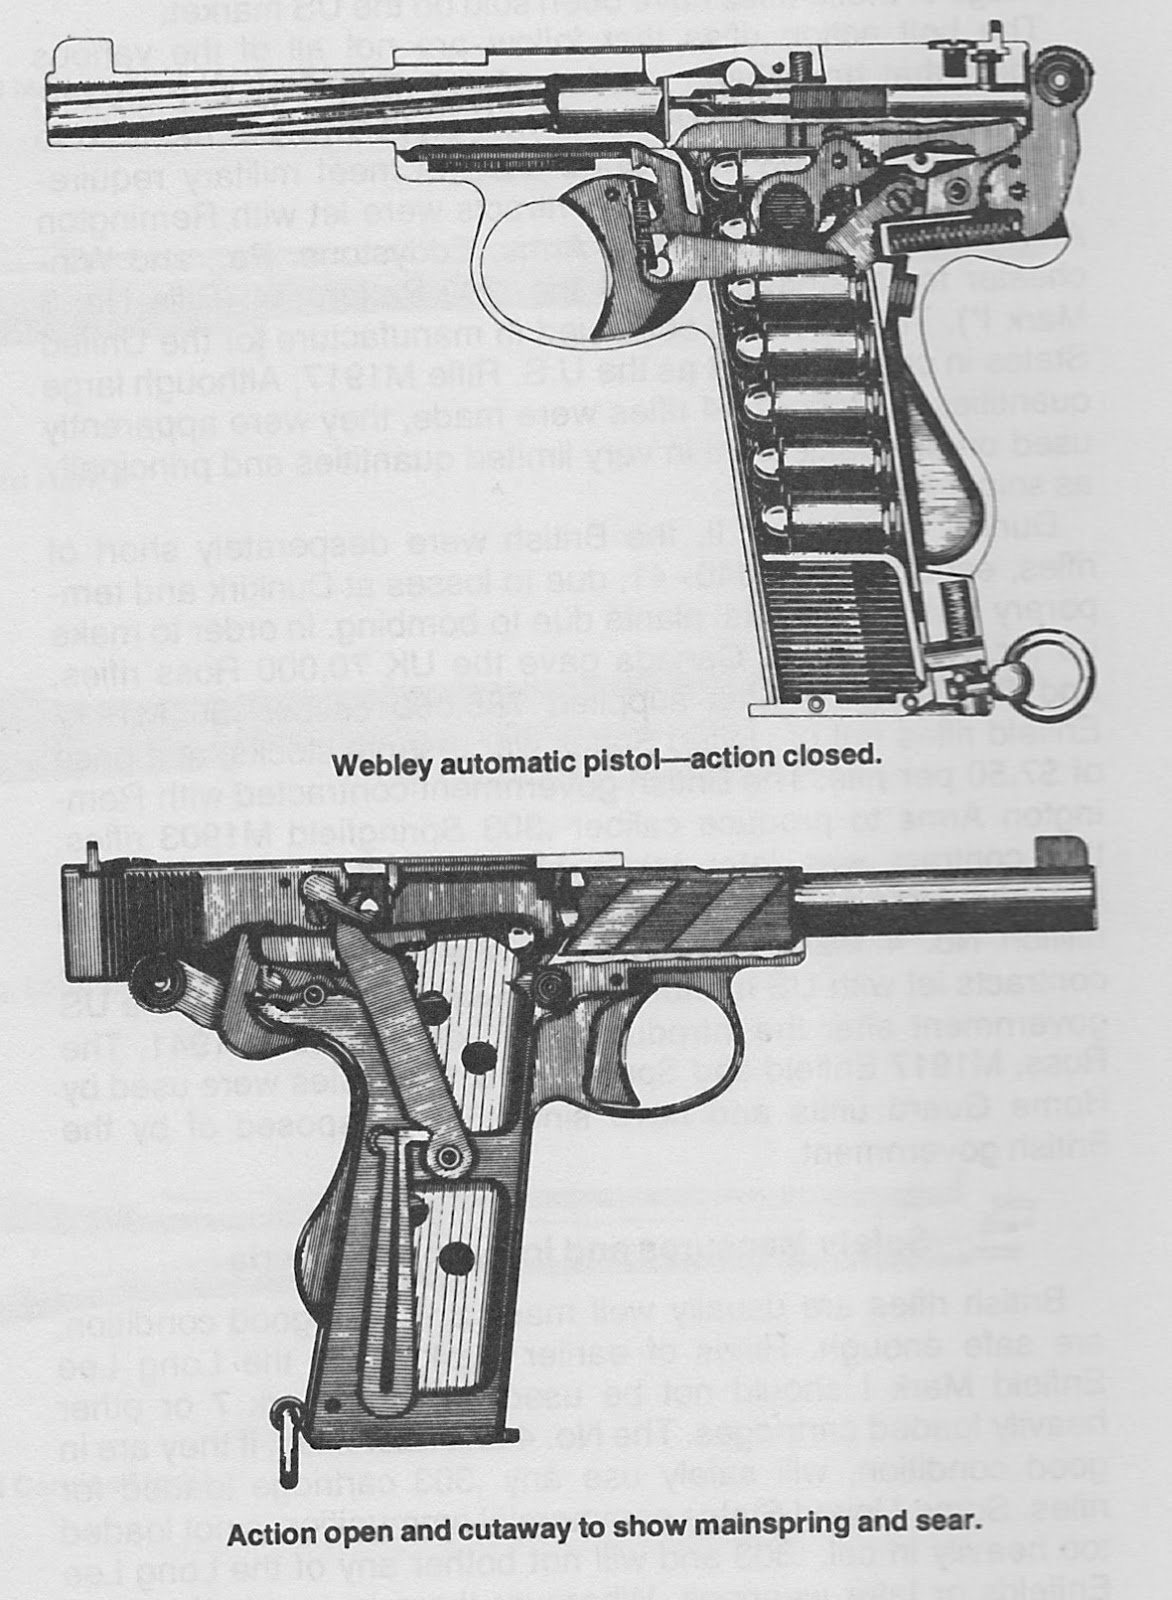 generic semi auto handgun parts diagram 7 pin trailer light wiring pistol get free image about